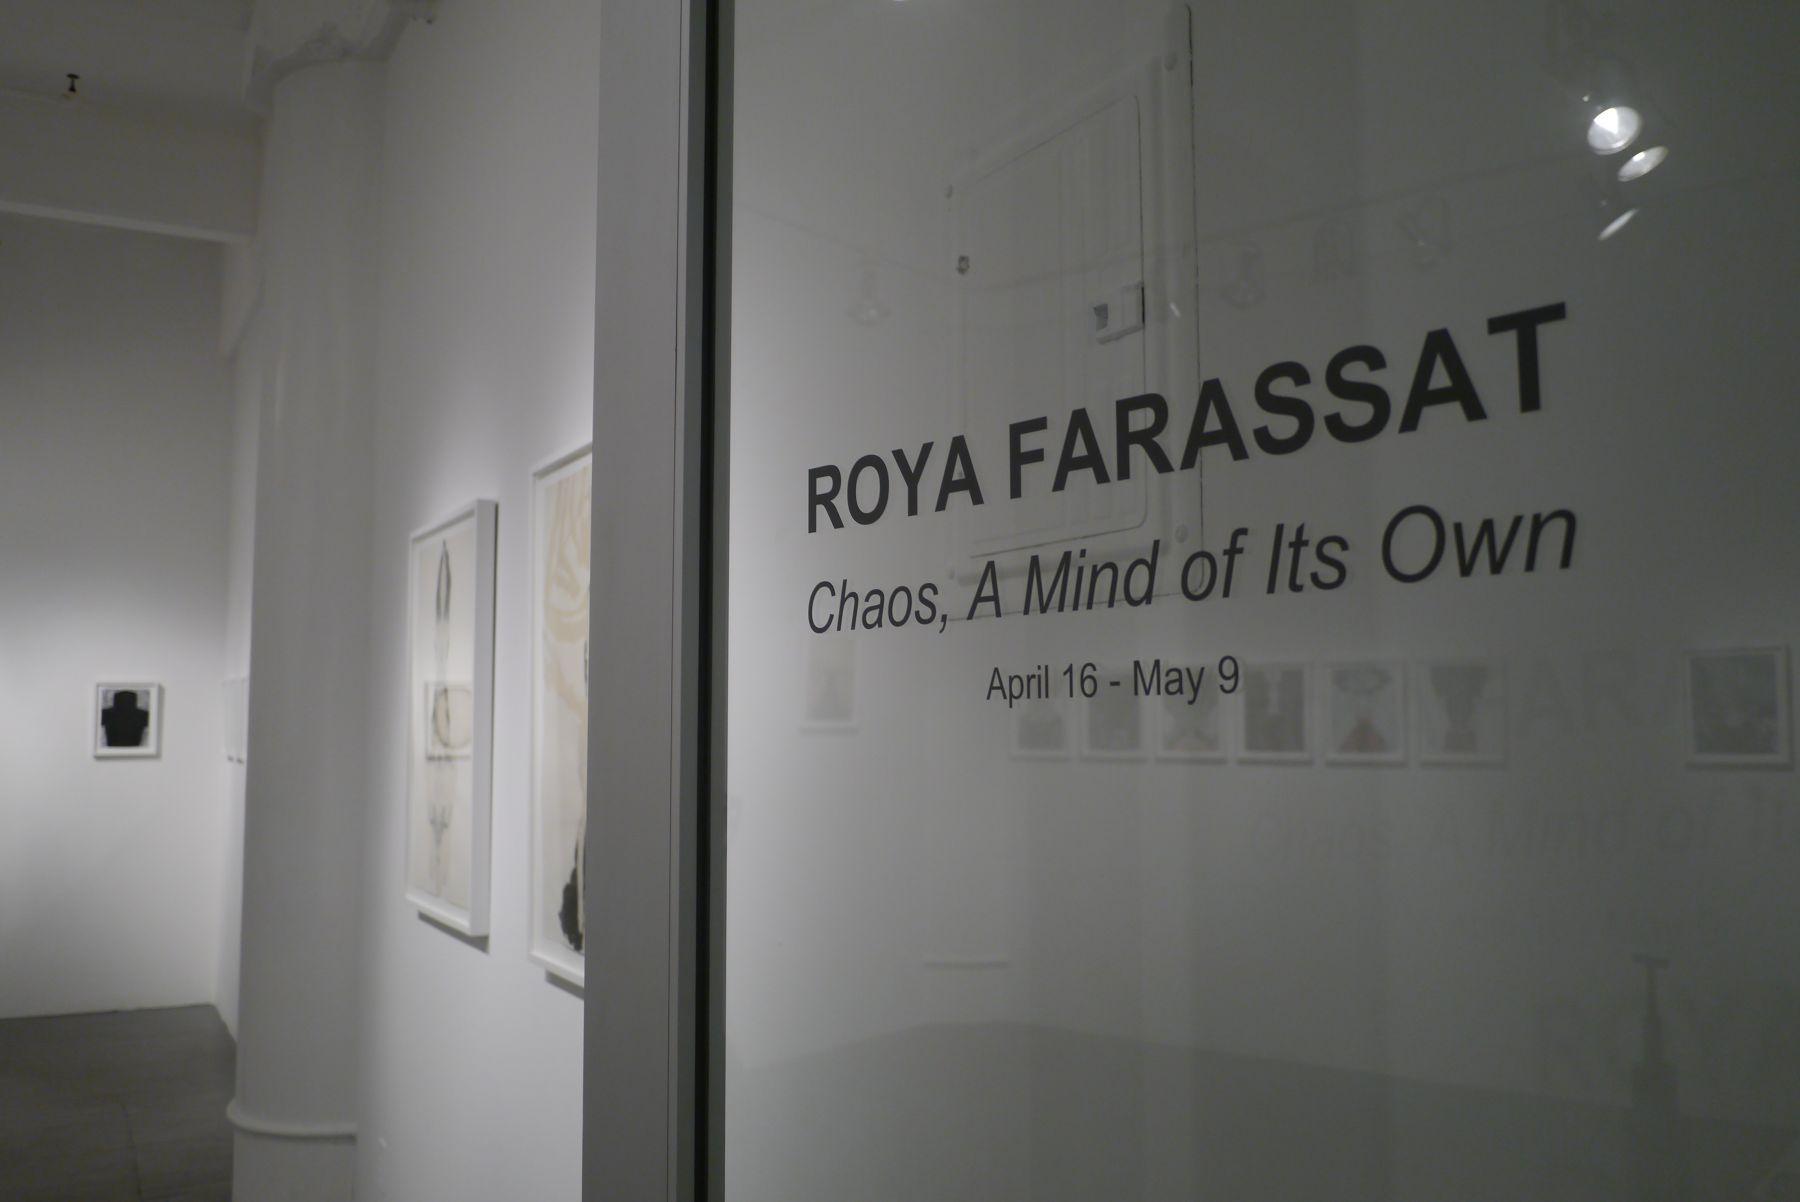 Roya Farassat